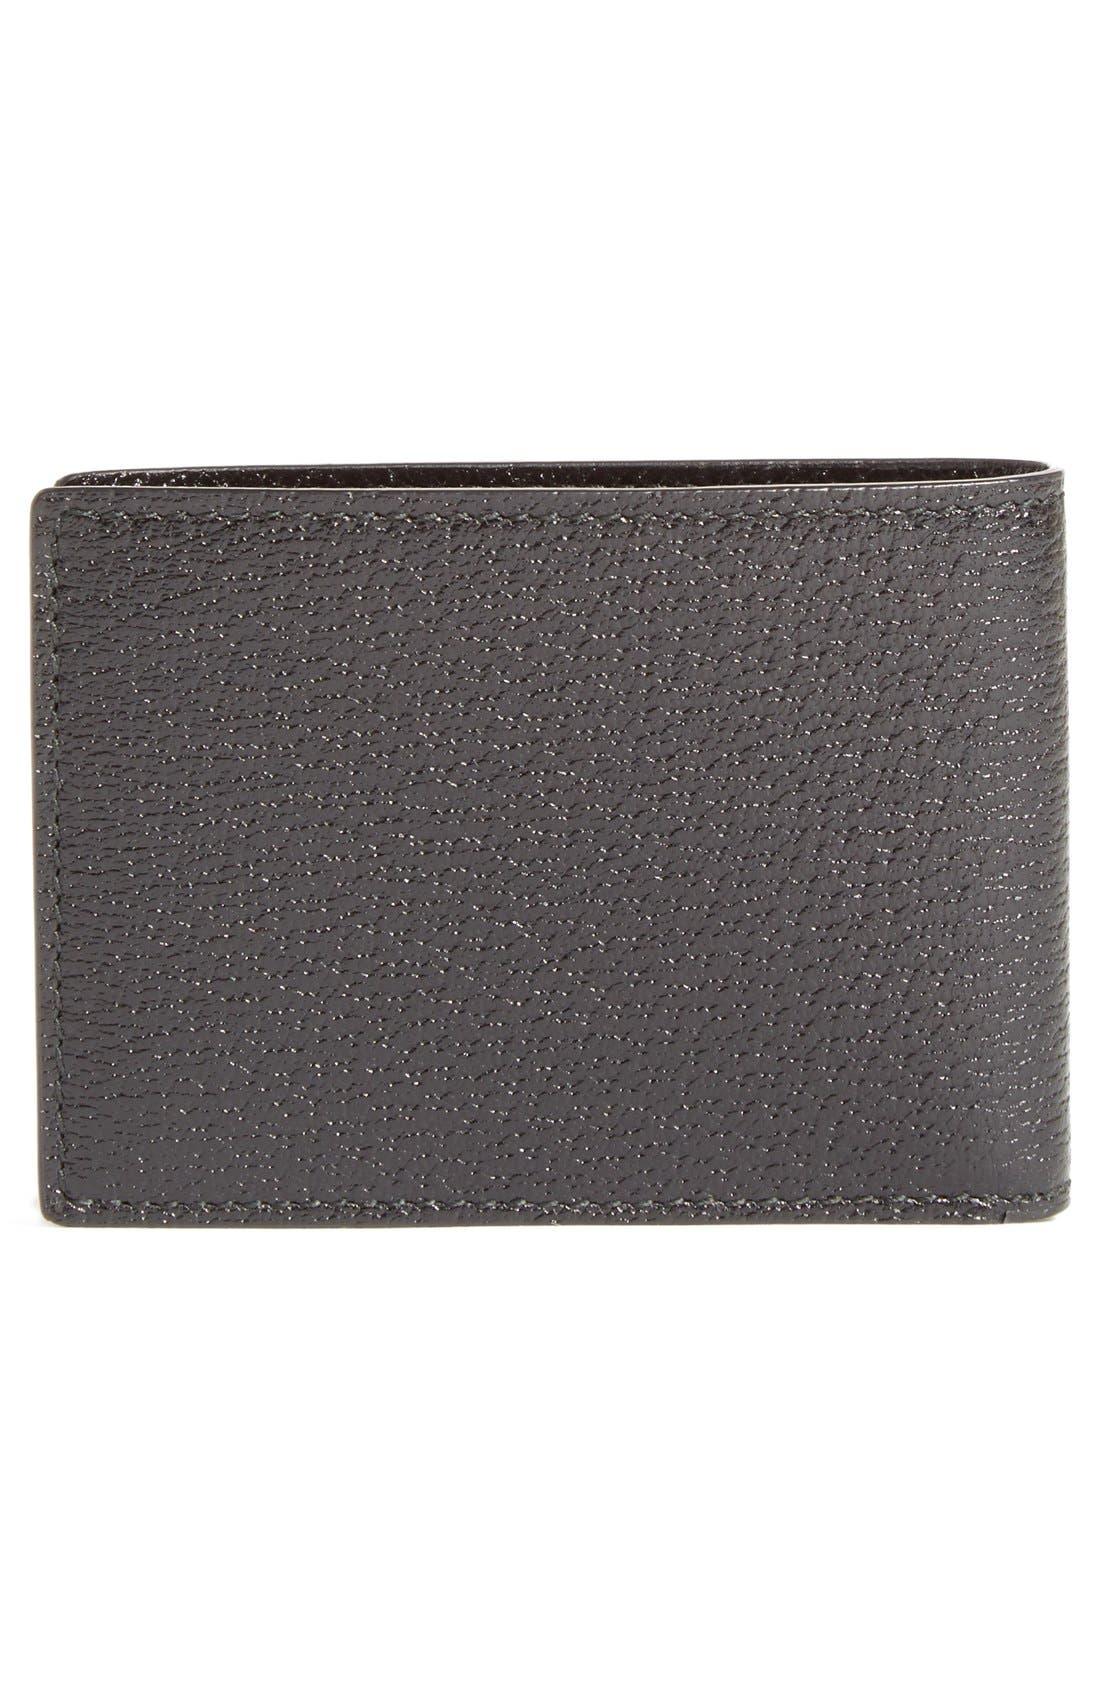 Marmont Leather Wallet,                             Alternate thumbnail 3, color,                             Black